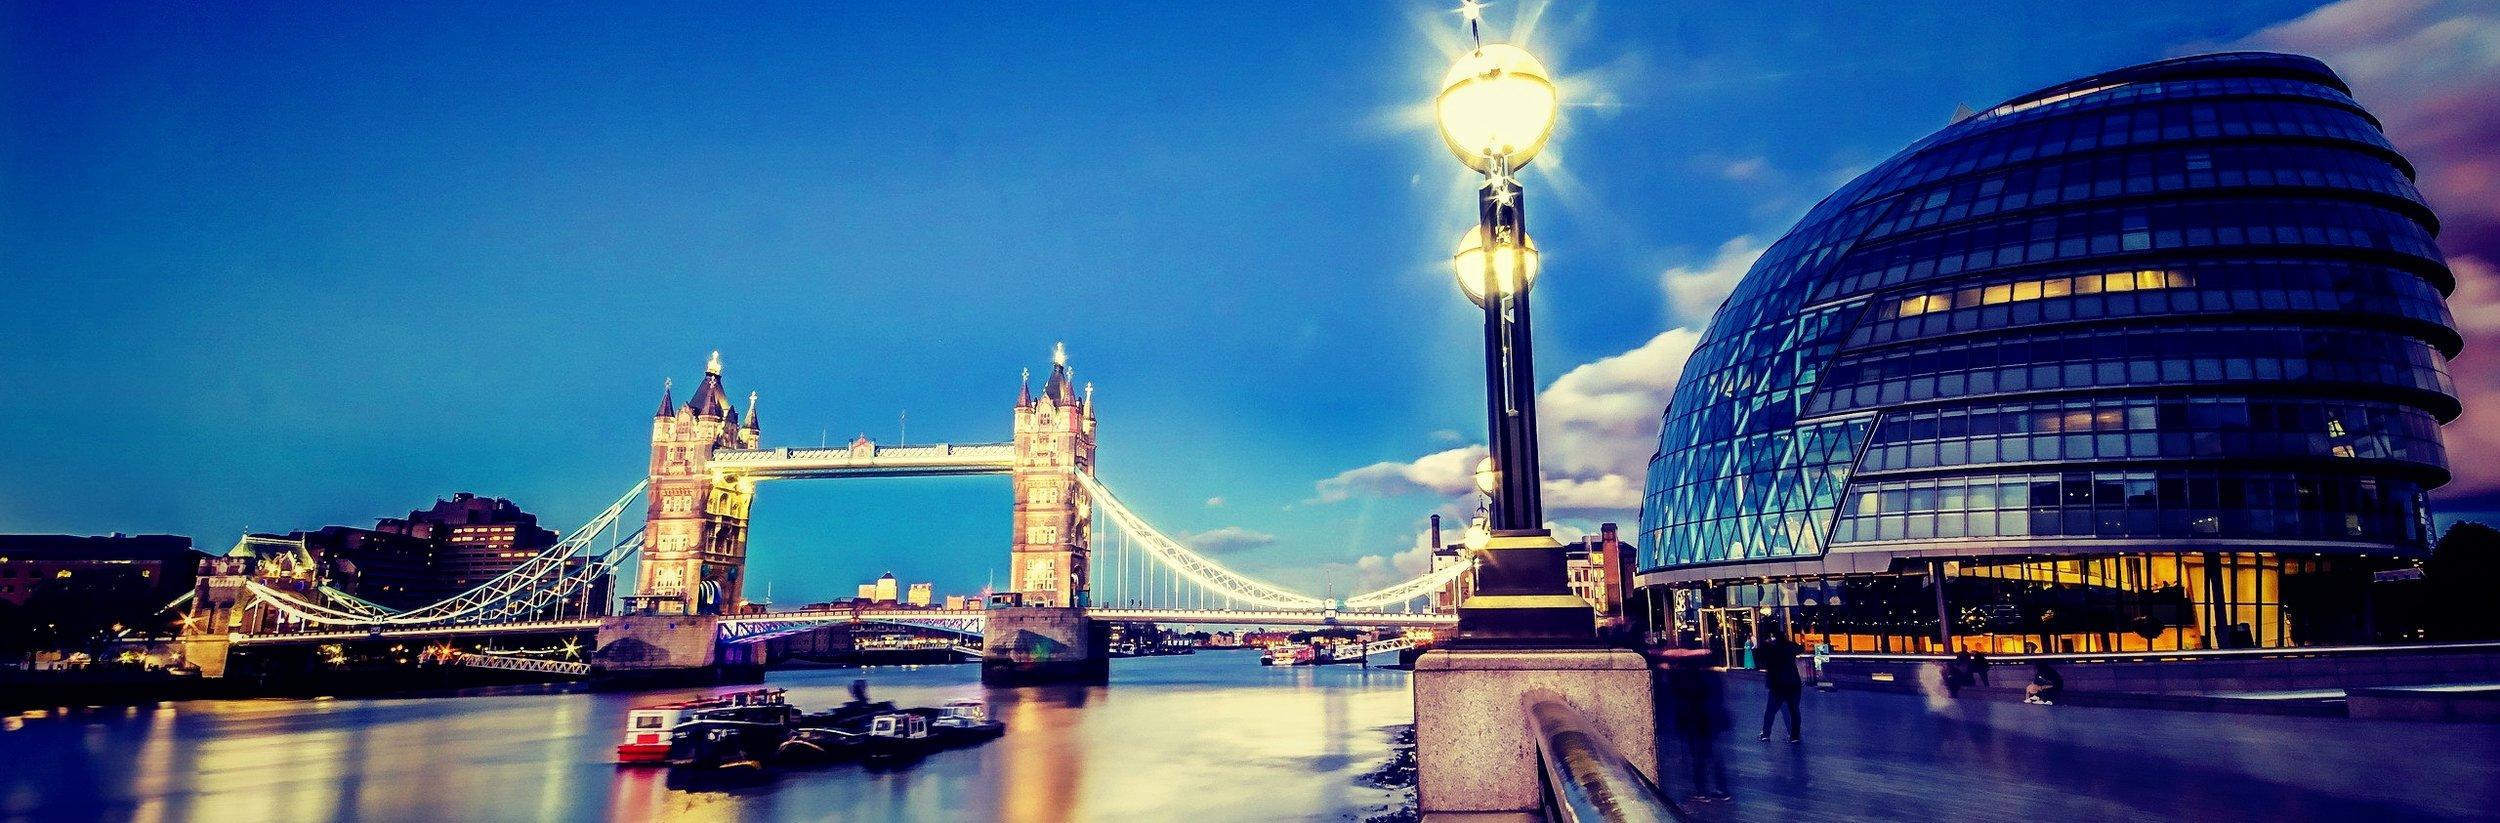 london_architecture-wallpaper-2560x1600_Fotor.jpg